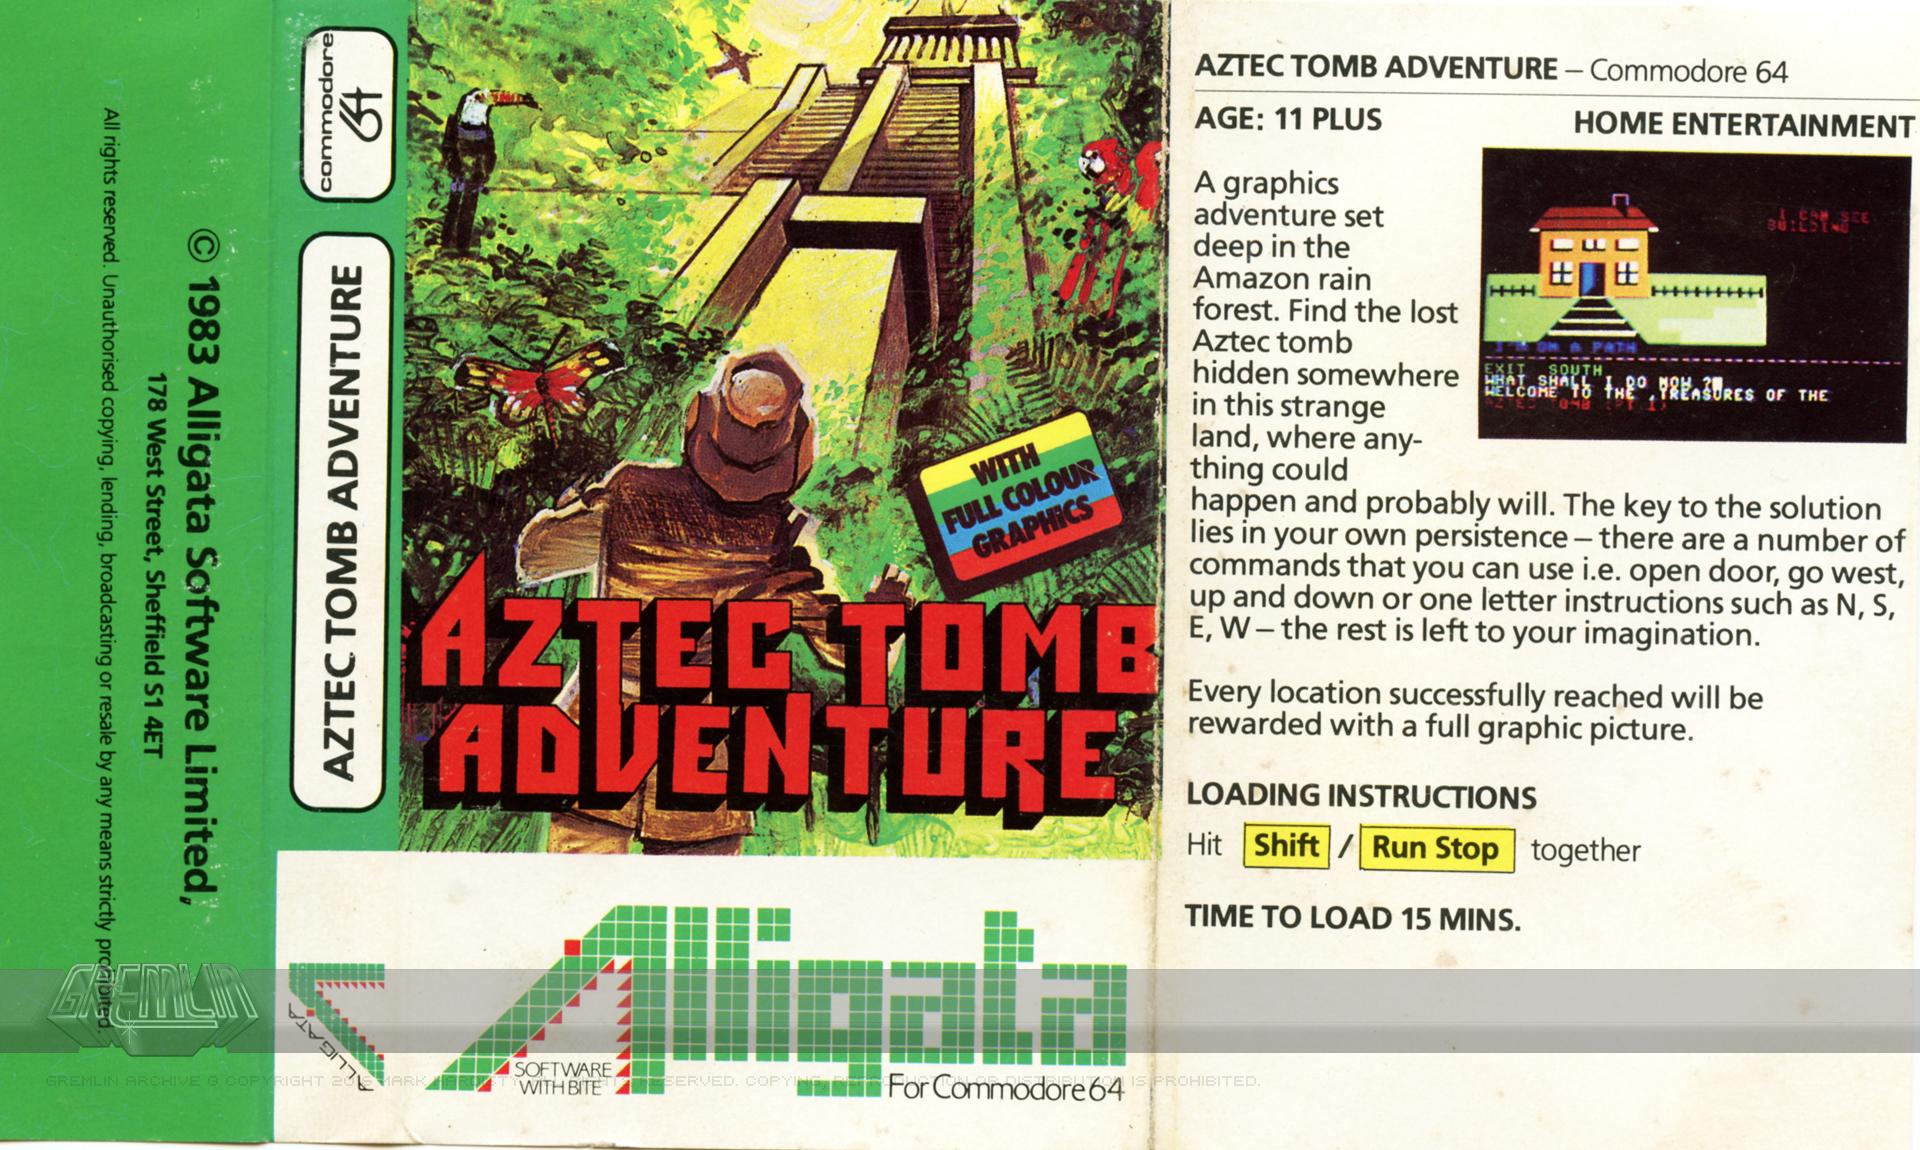 Aztec Adventure